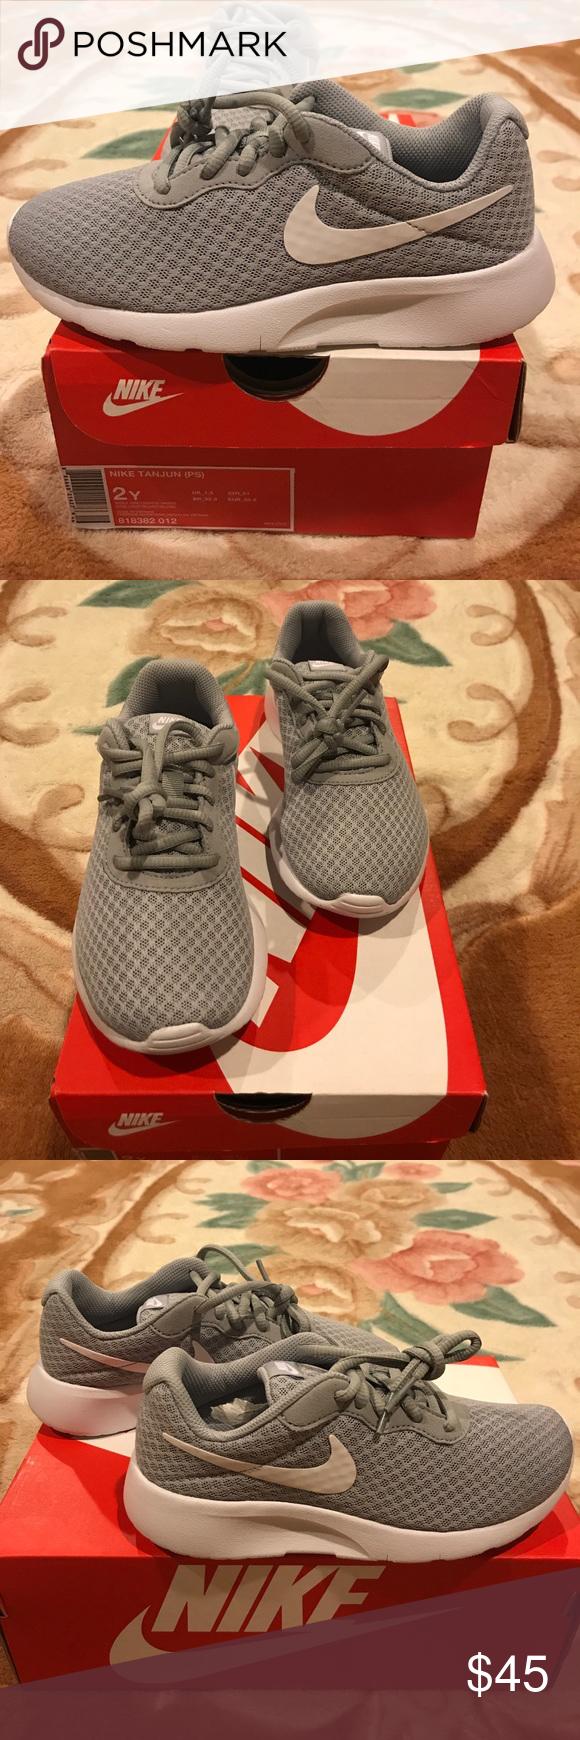 Brand new Girls Nike shoes NWT